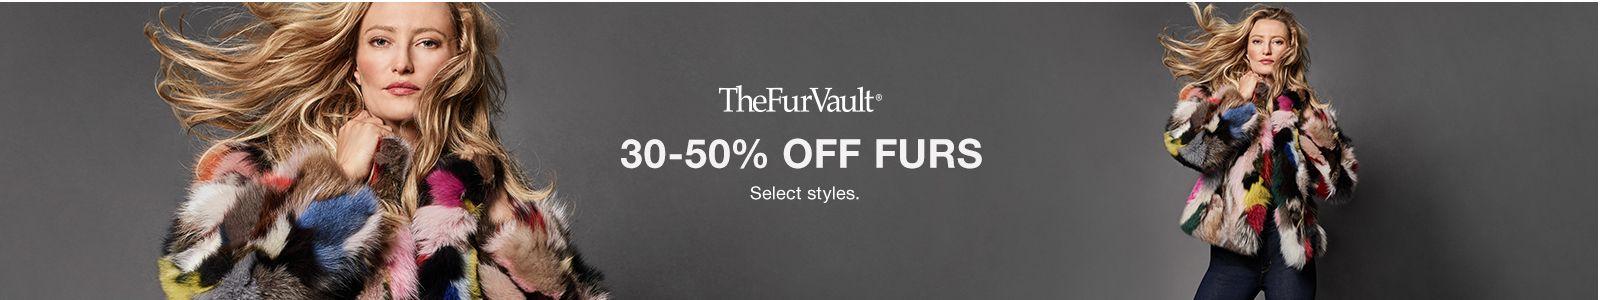 The Fur Vault, 30-50 percent off furs, Select styles